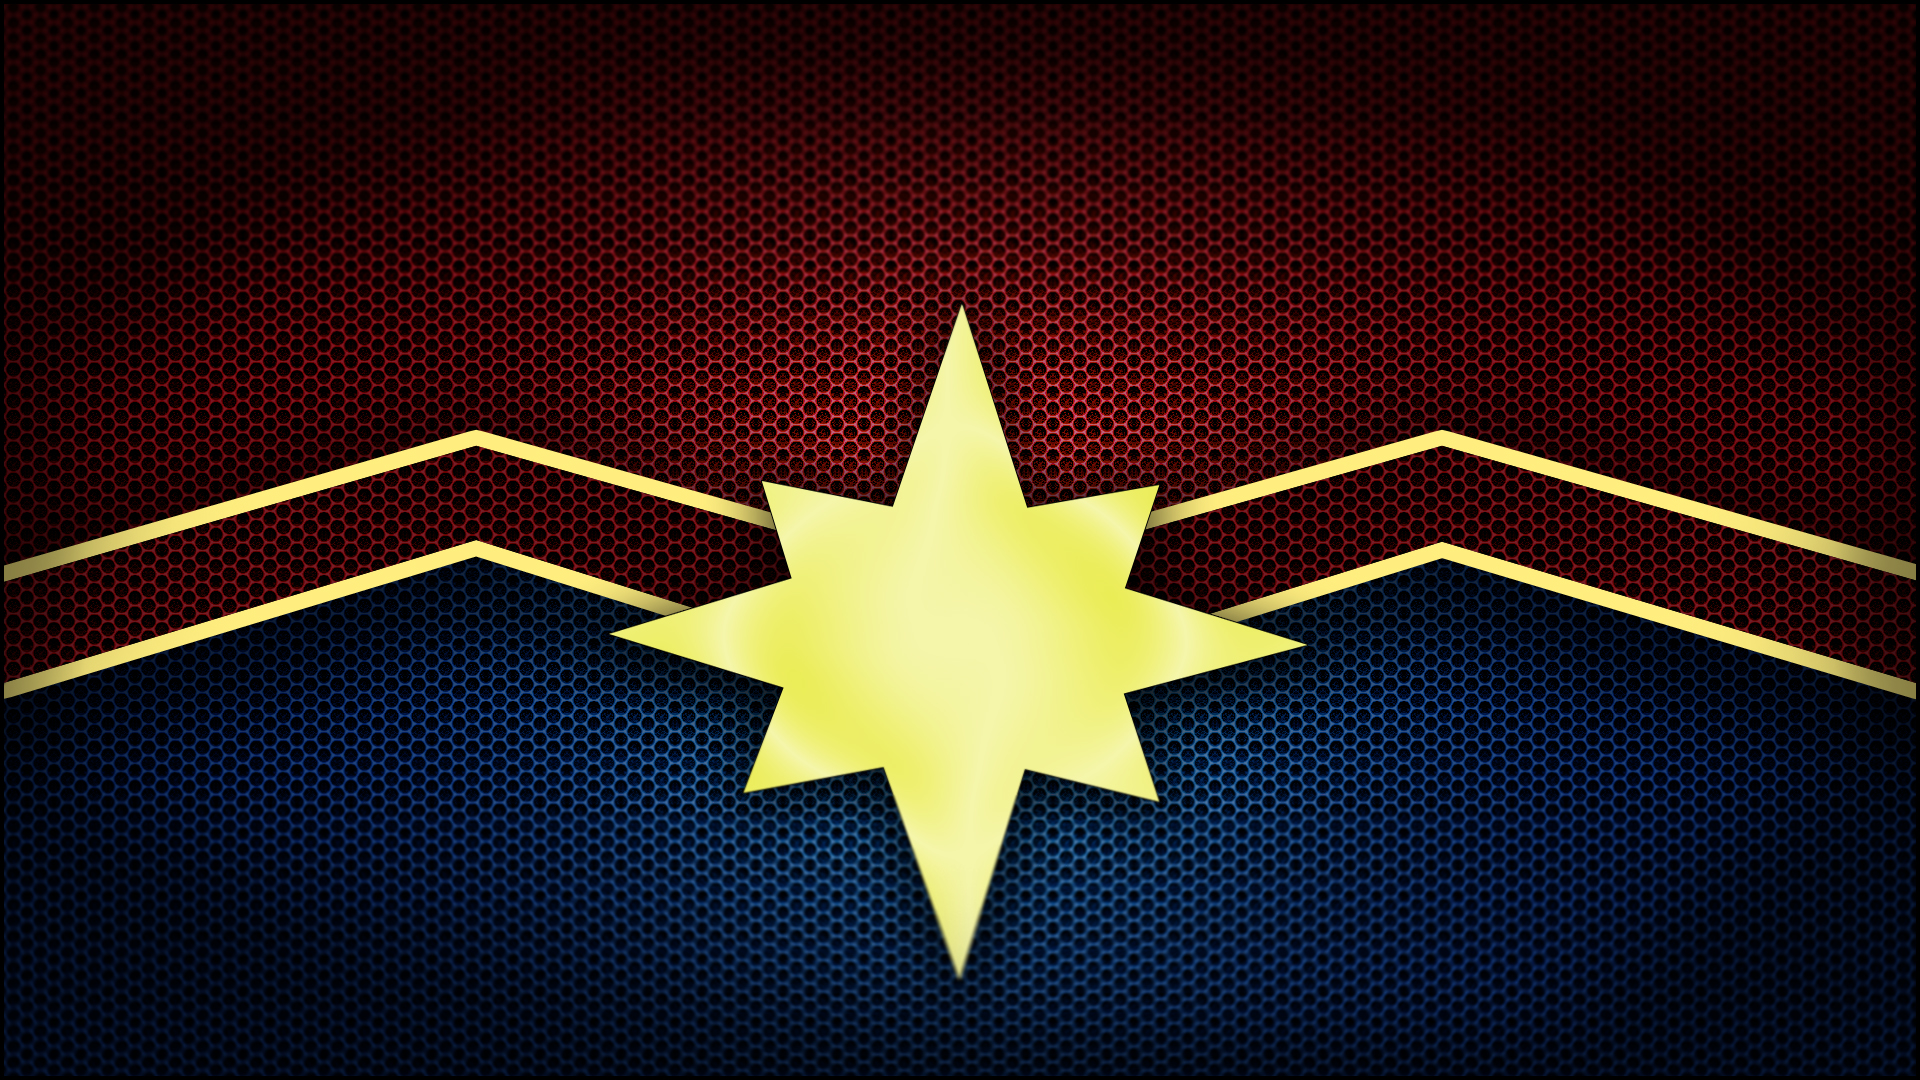 Captain Marvel Iphone Wallpaper